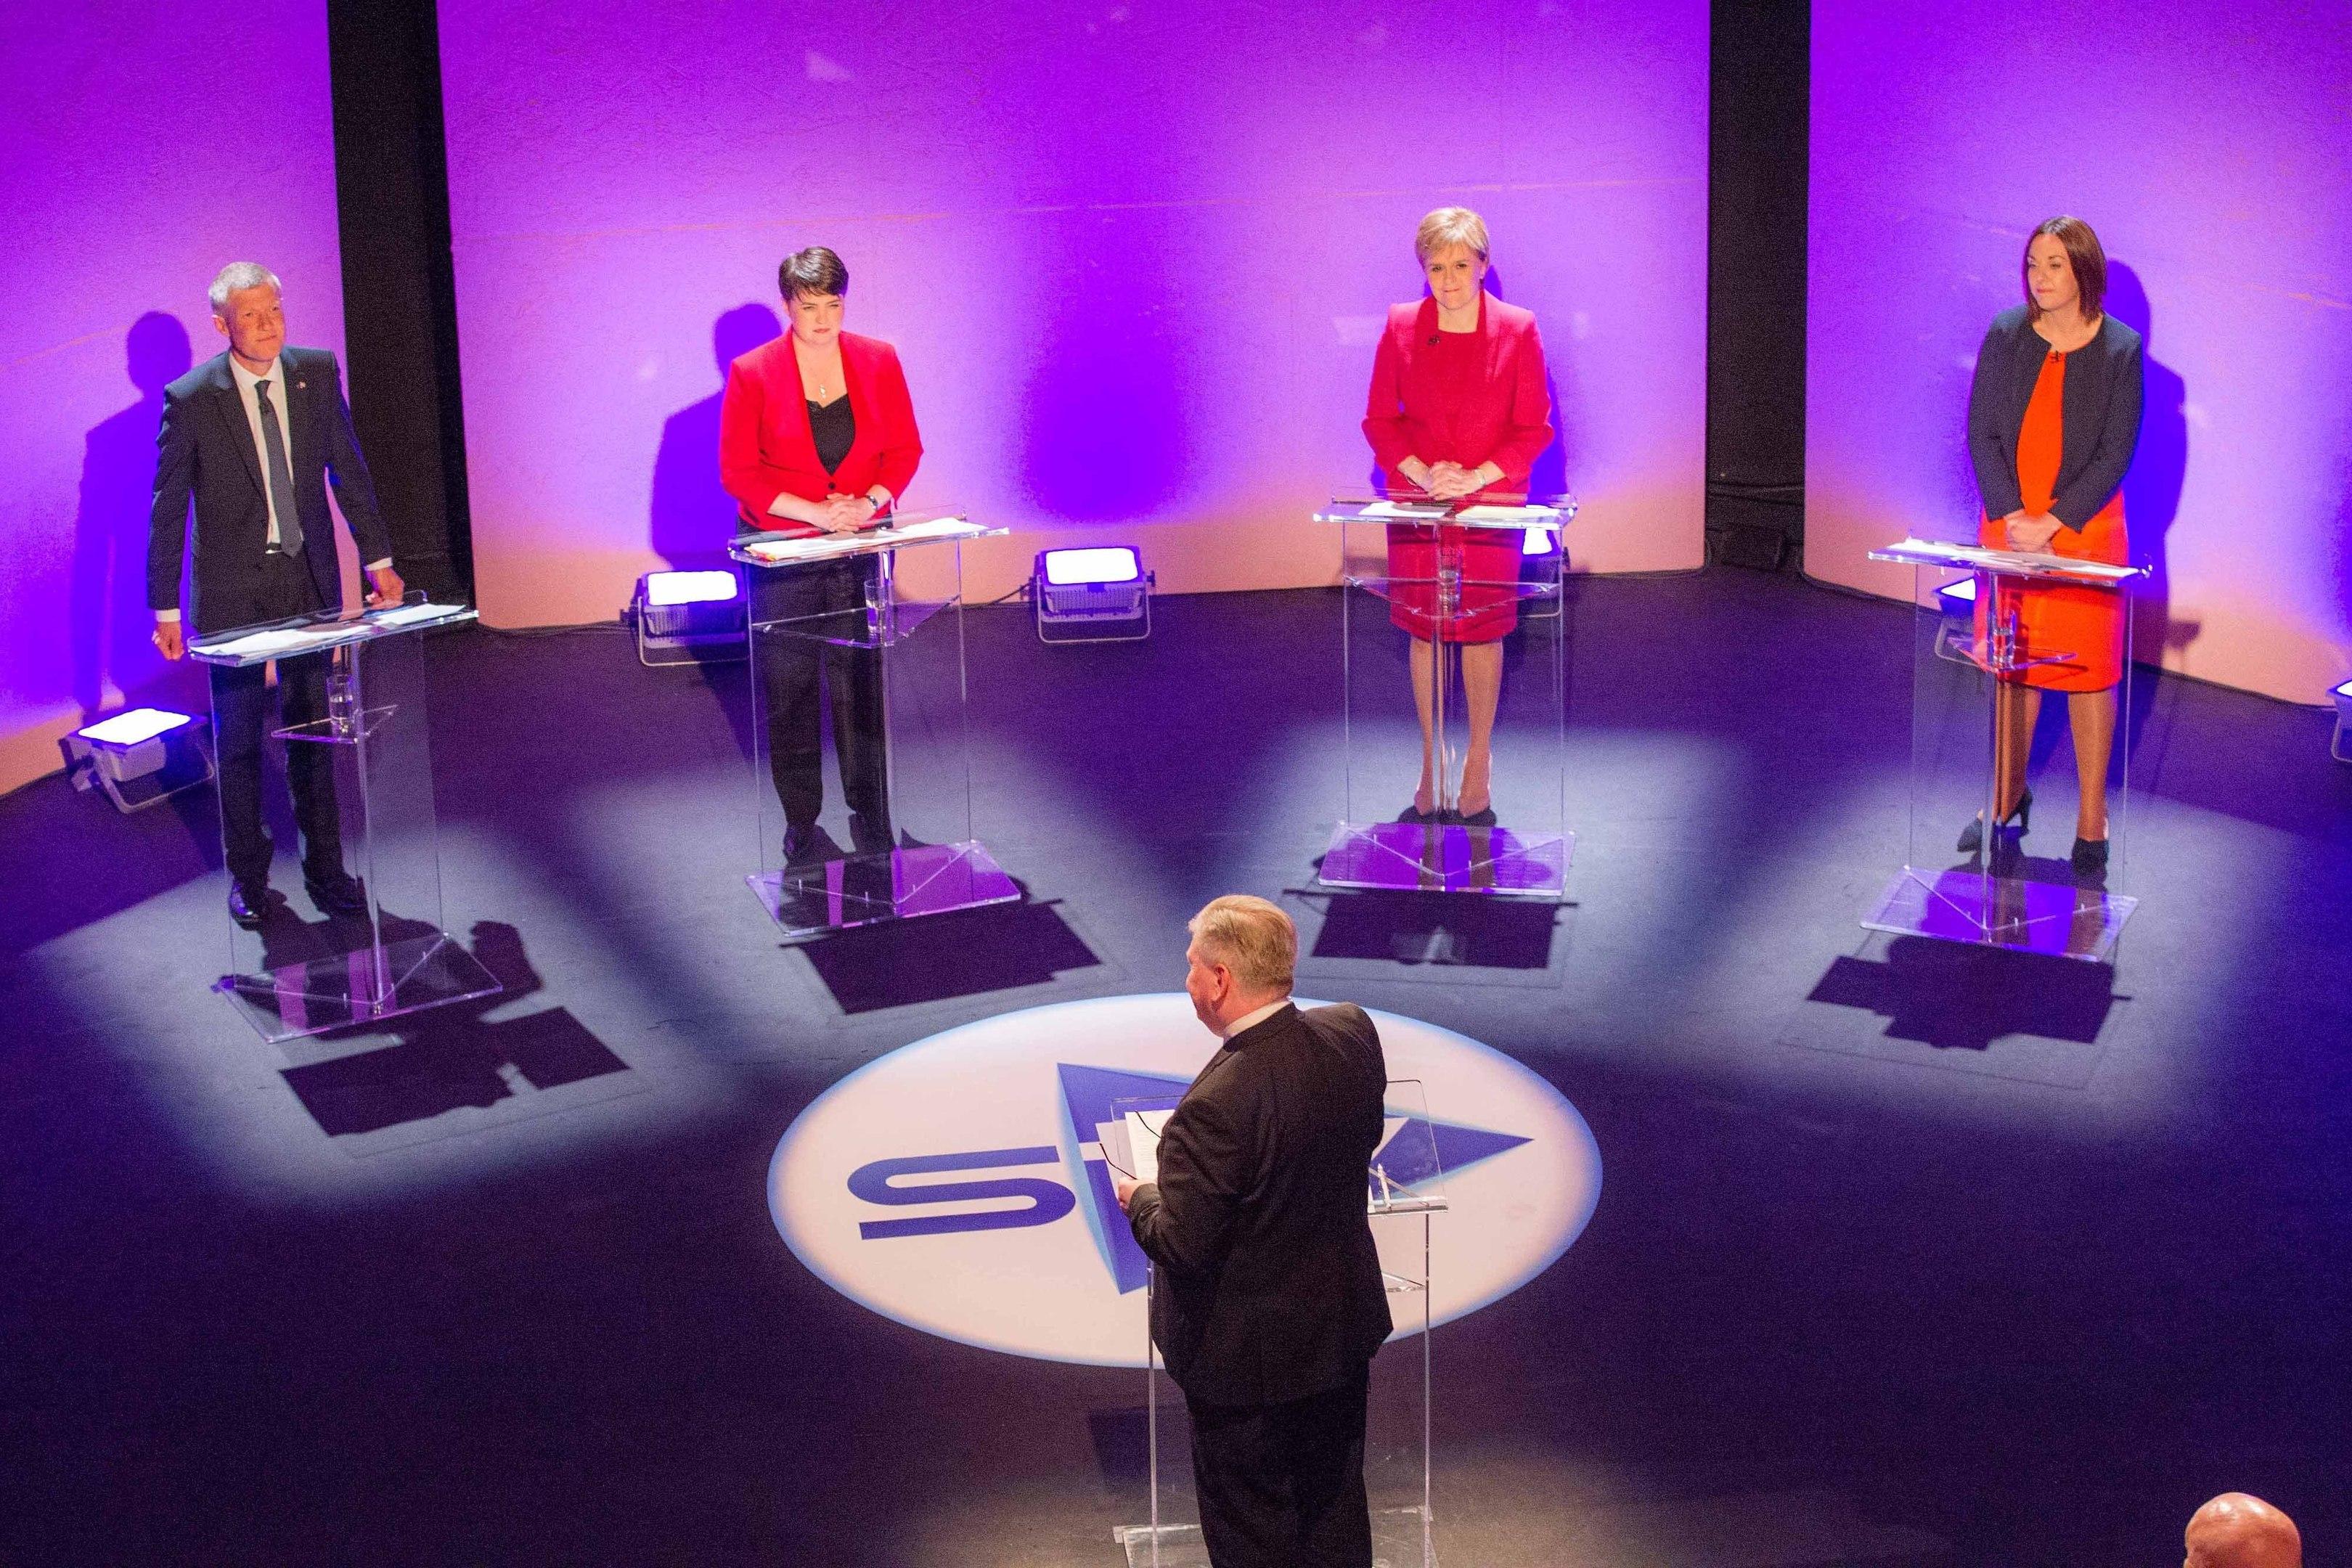 STV's political editor Bernard Ponsonby presents leaders debate with, from left, Scottish Liberal Democrat leader Willie Rennie, Scottish Conservative leader Ruth Davidson, SNP leader Nicola Sturgeon and Scottish Labour leader Kezia Dugdale.